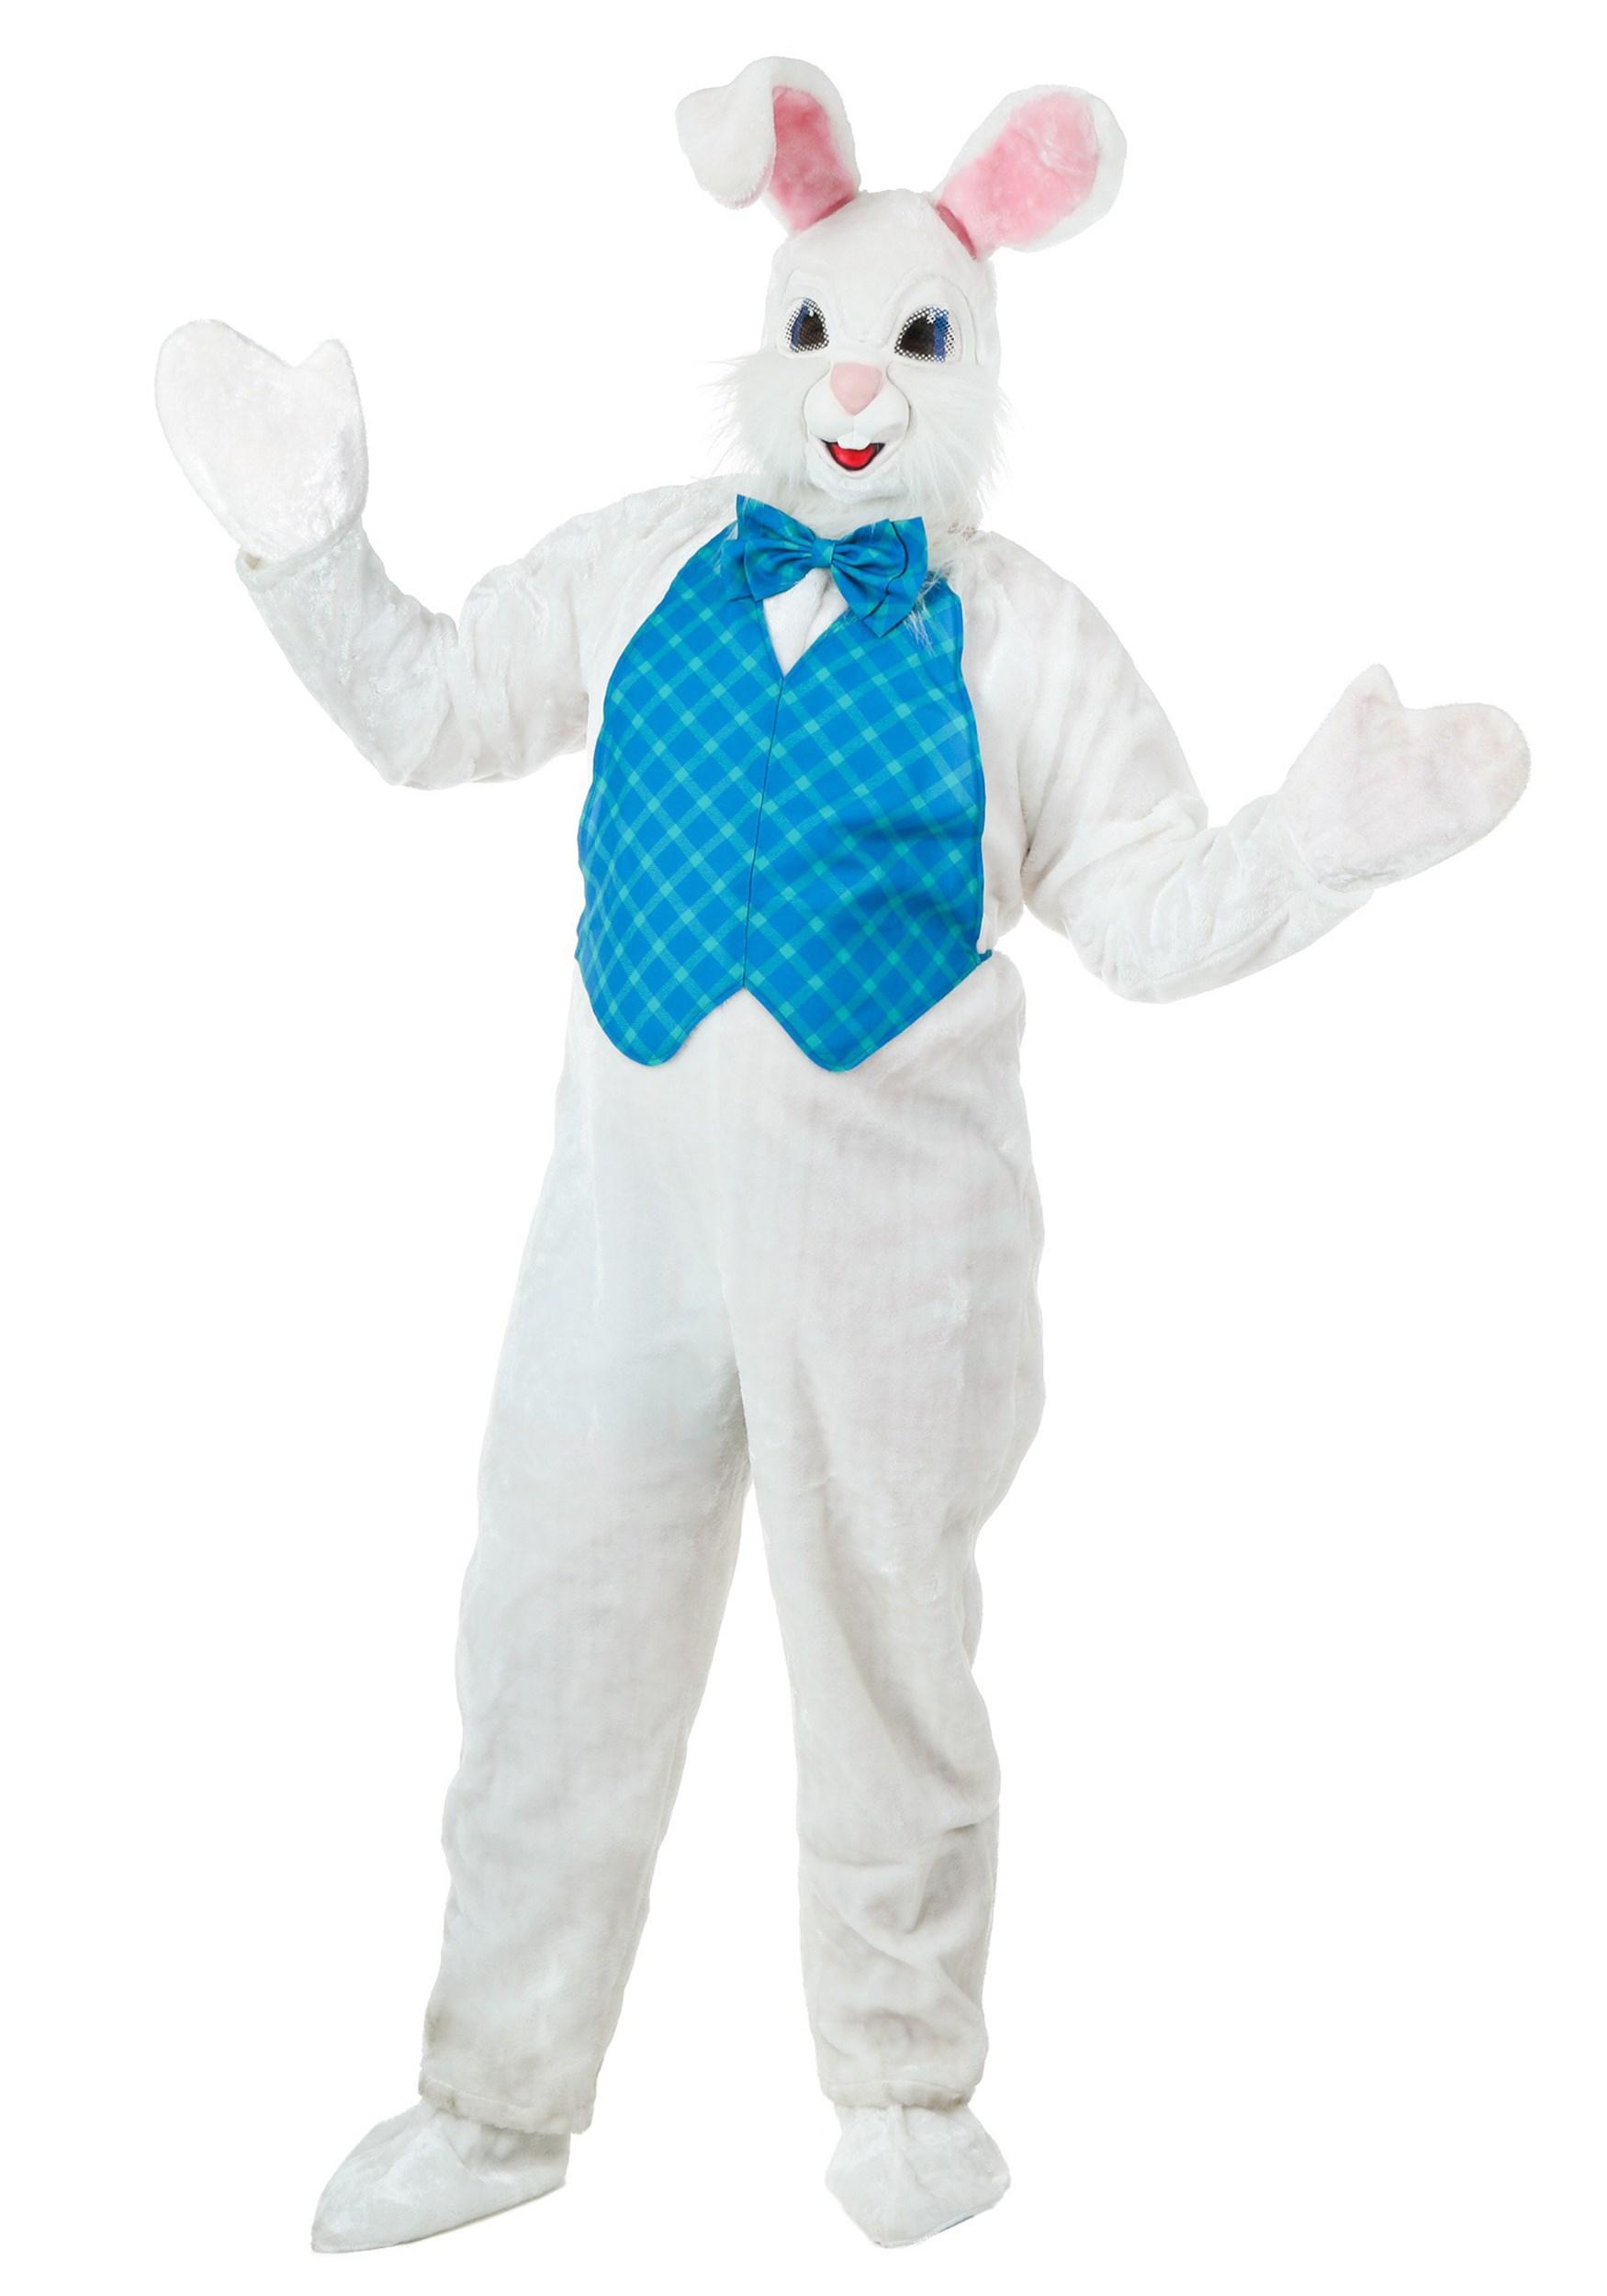 Happy Easter Bunny Costume